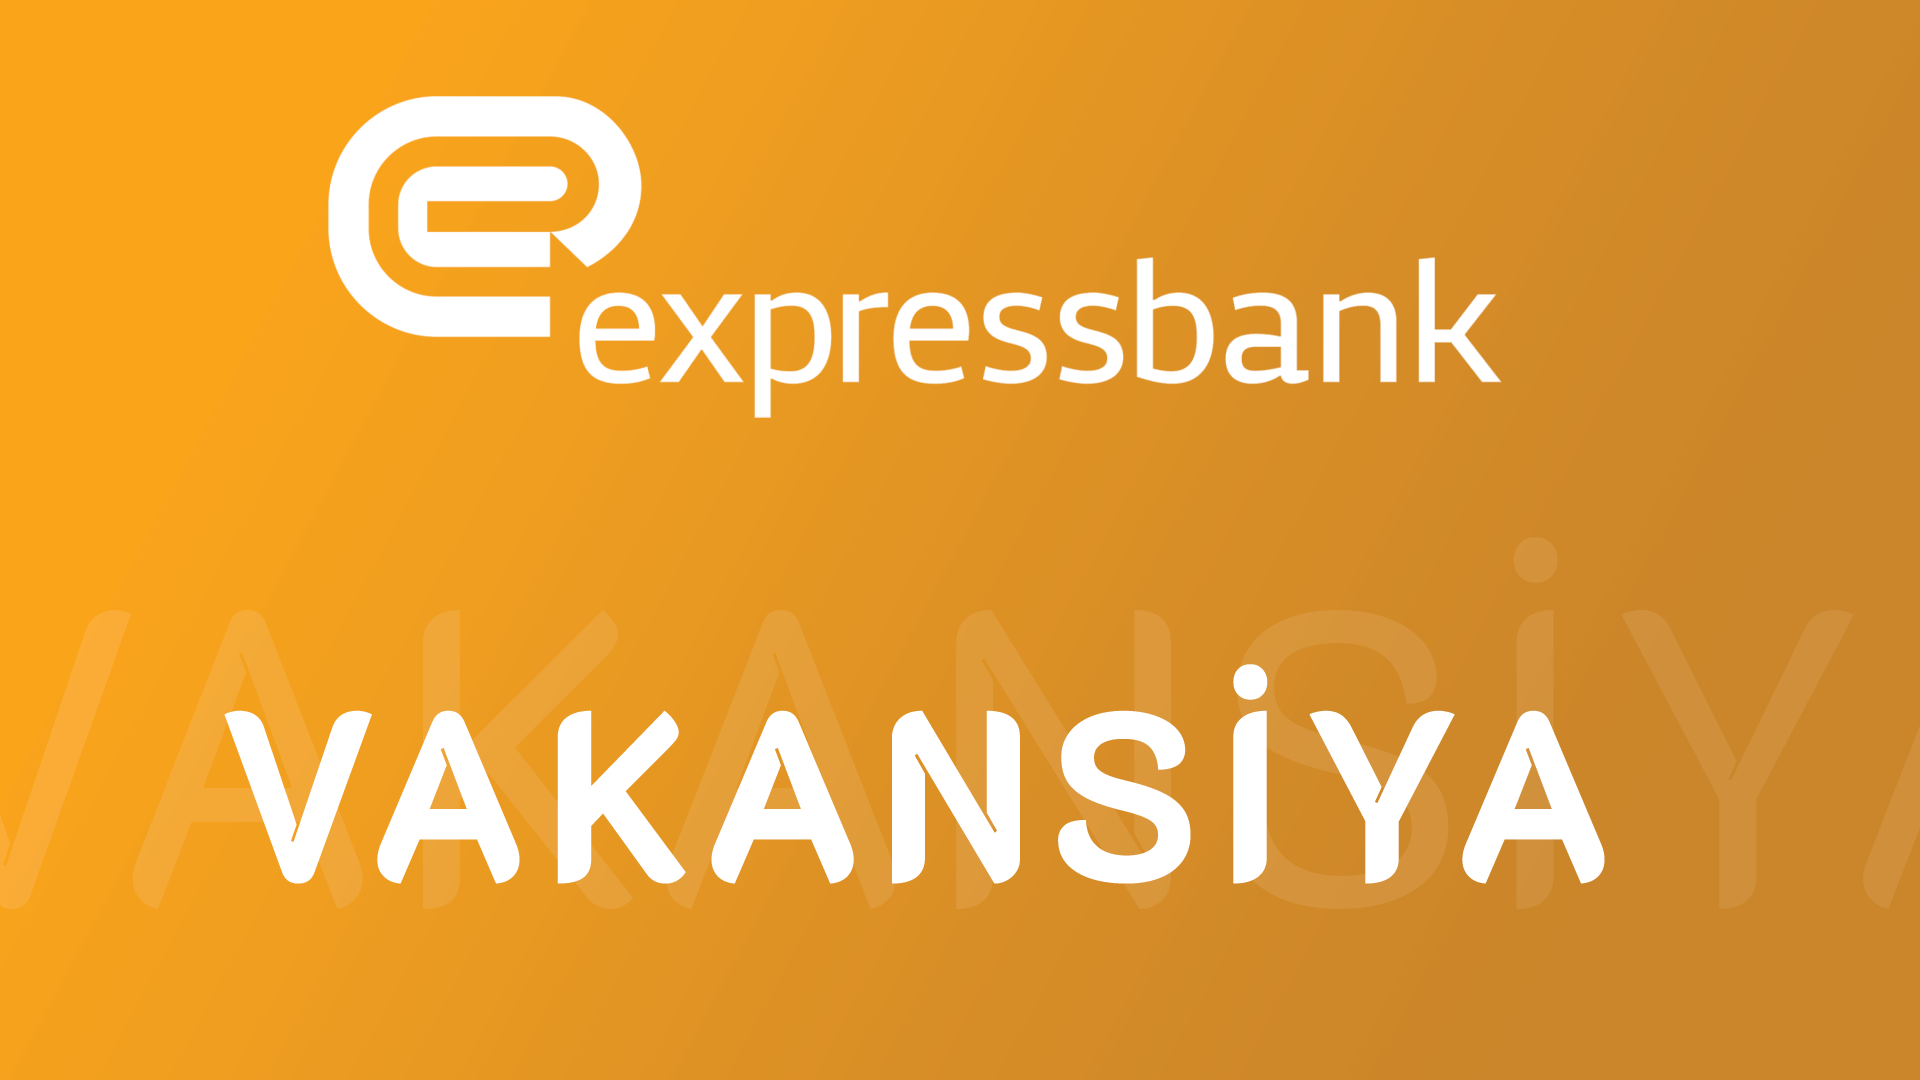 Expressbank-da İŞ VAR!! - 6 Yeni VAKANSİYA